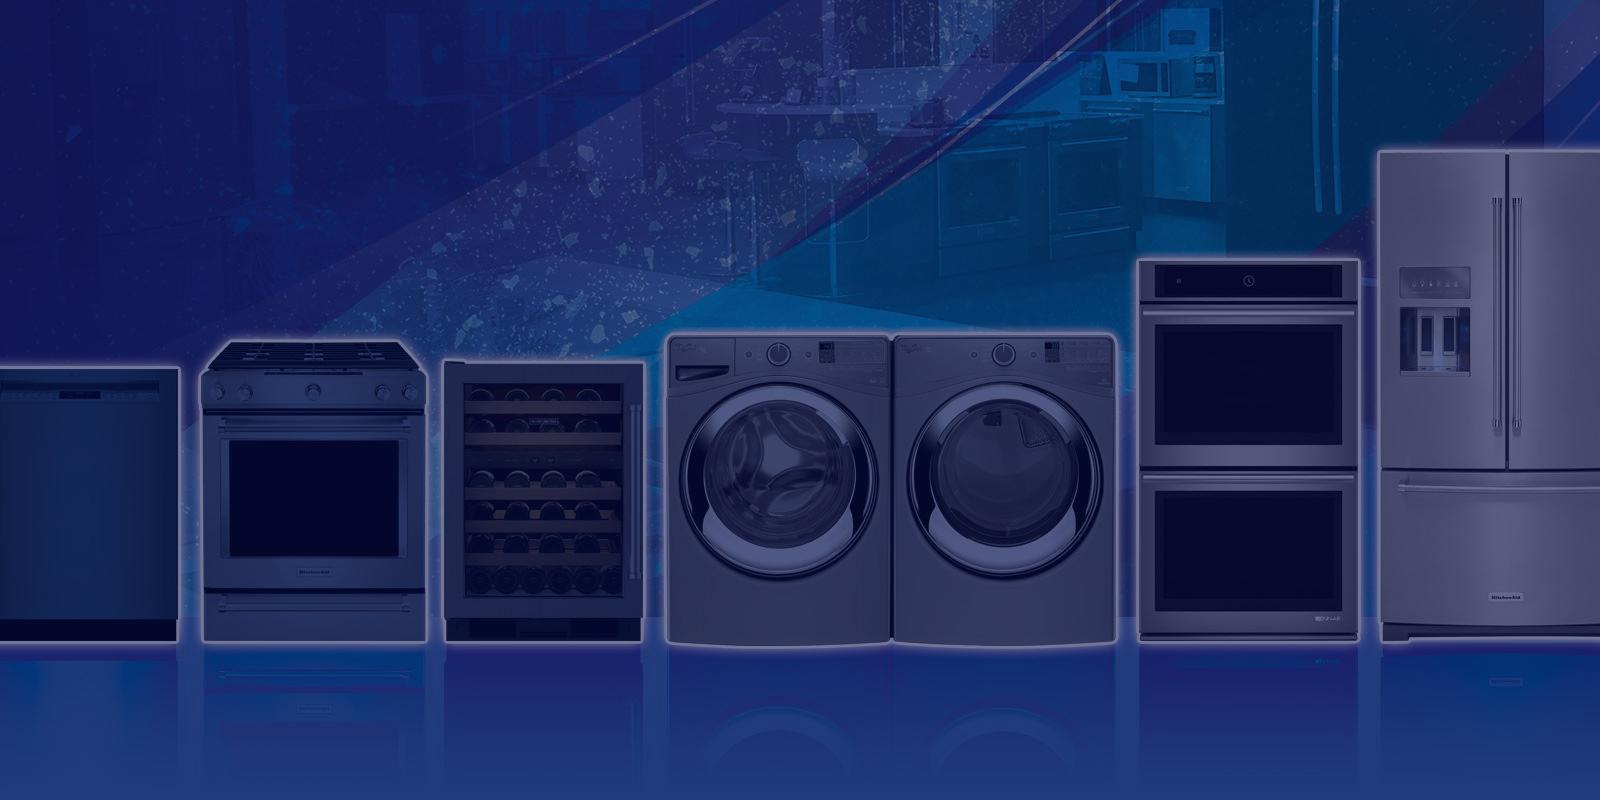 Service Area New Tech Appliances